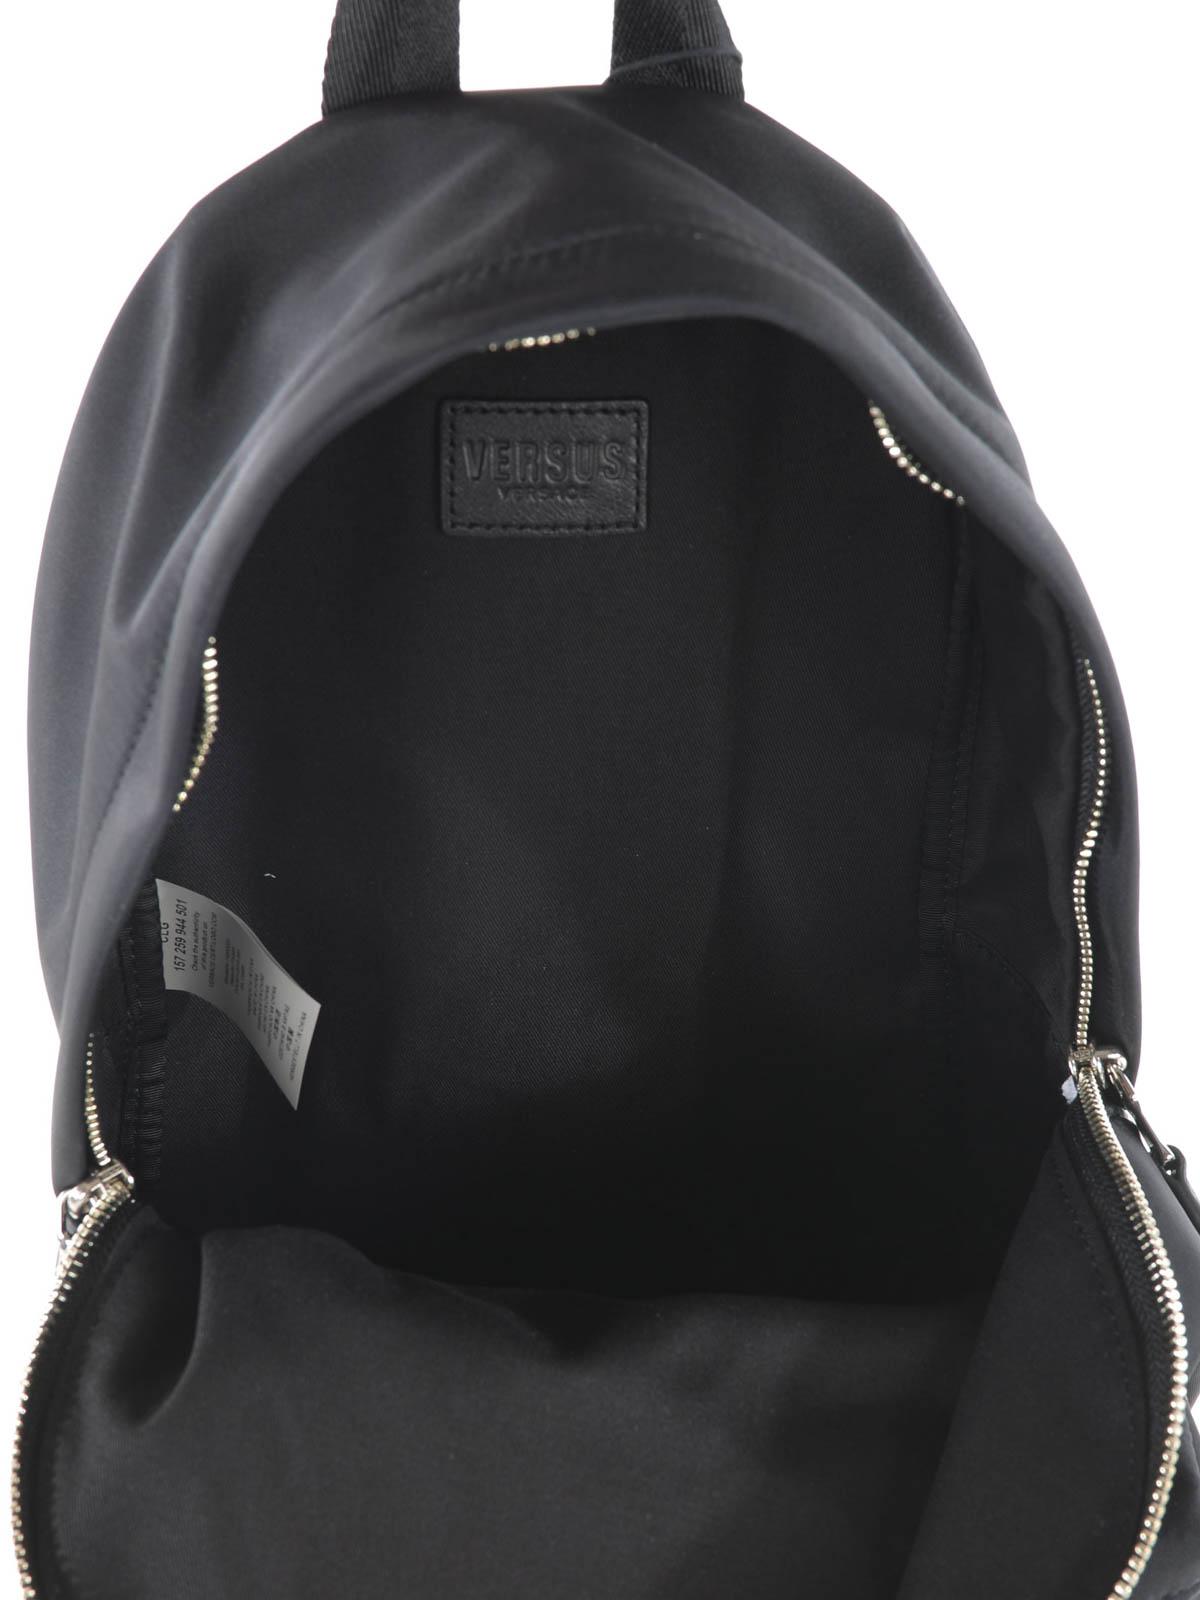 Versus Versace - LION HEAD DETAIL NYLON BACKPACK - backpacks ... 1f90846a64e9f